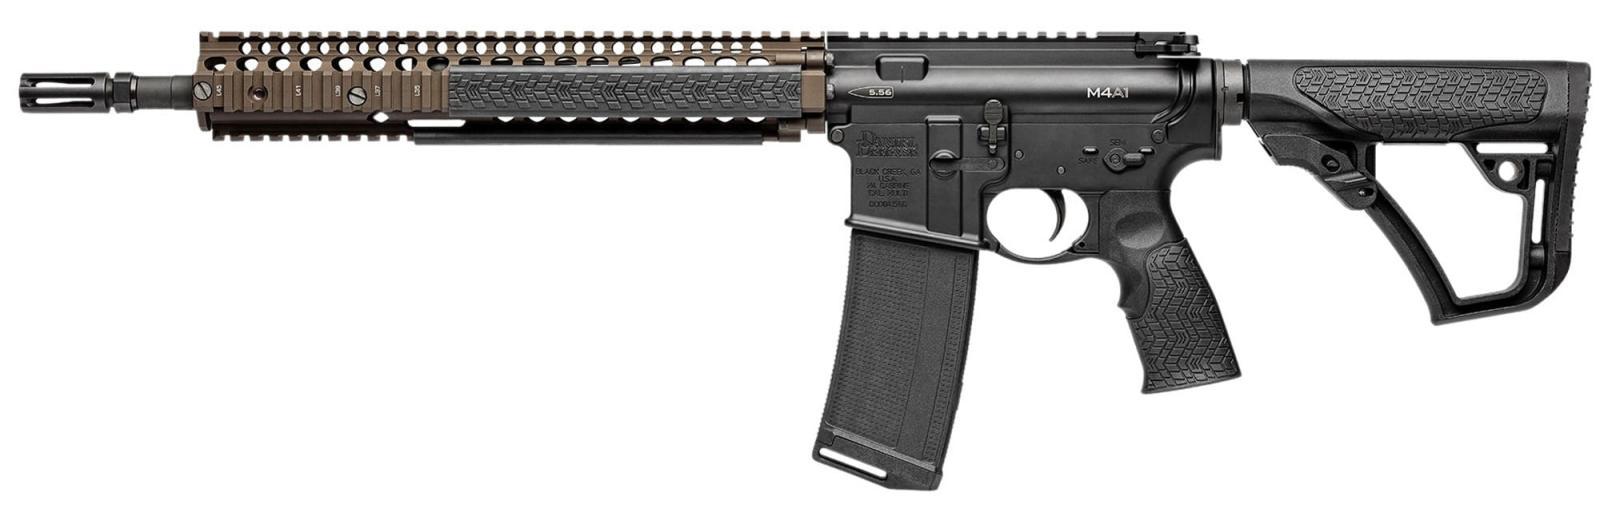 Carabine type AR15 DANIEL DEFENSE M4A1 FDE Cal 223 Rem